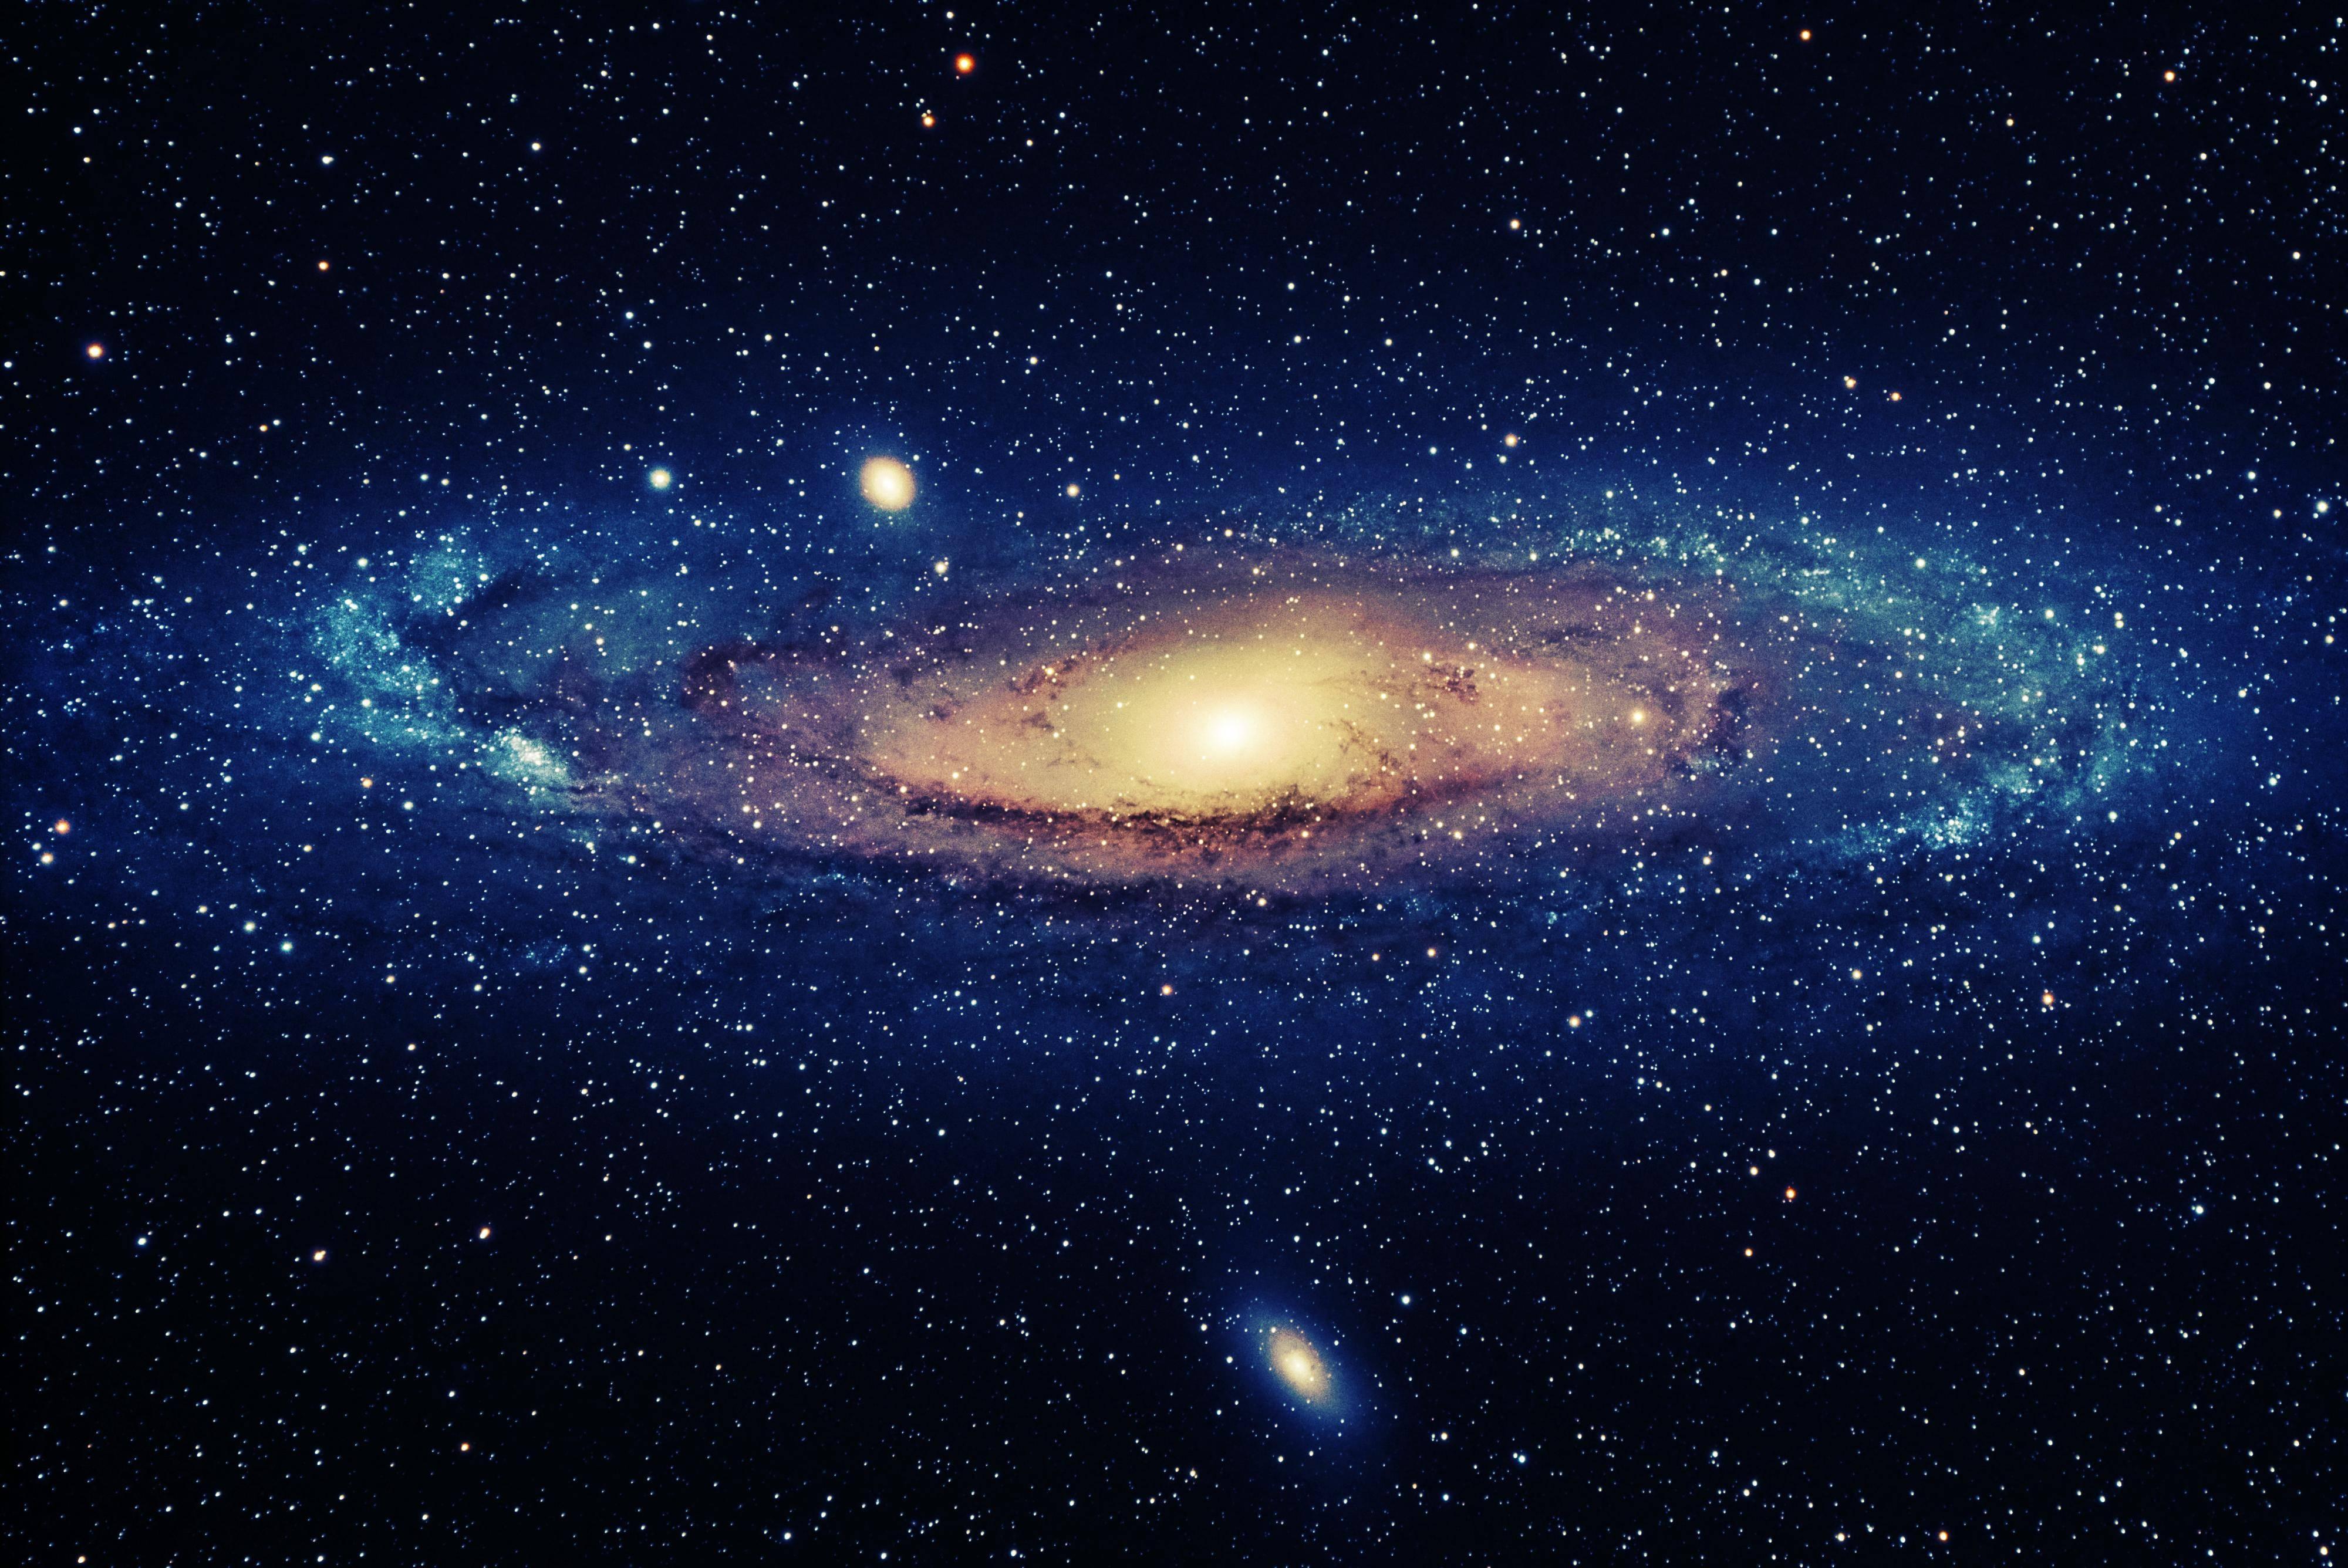 Risultati immagini per fotodi galassie ed extraterrestri